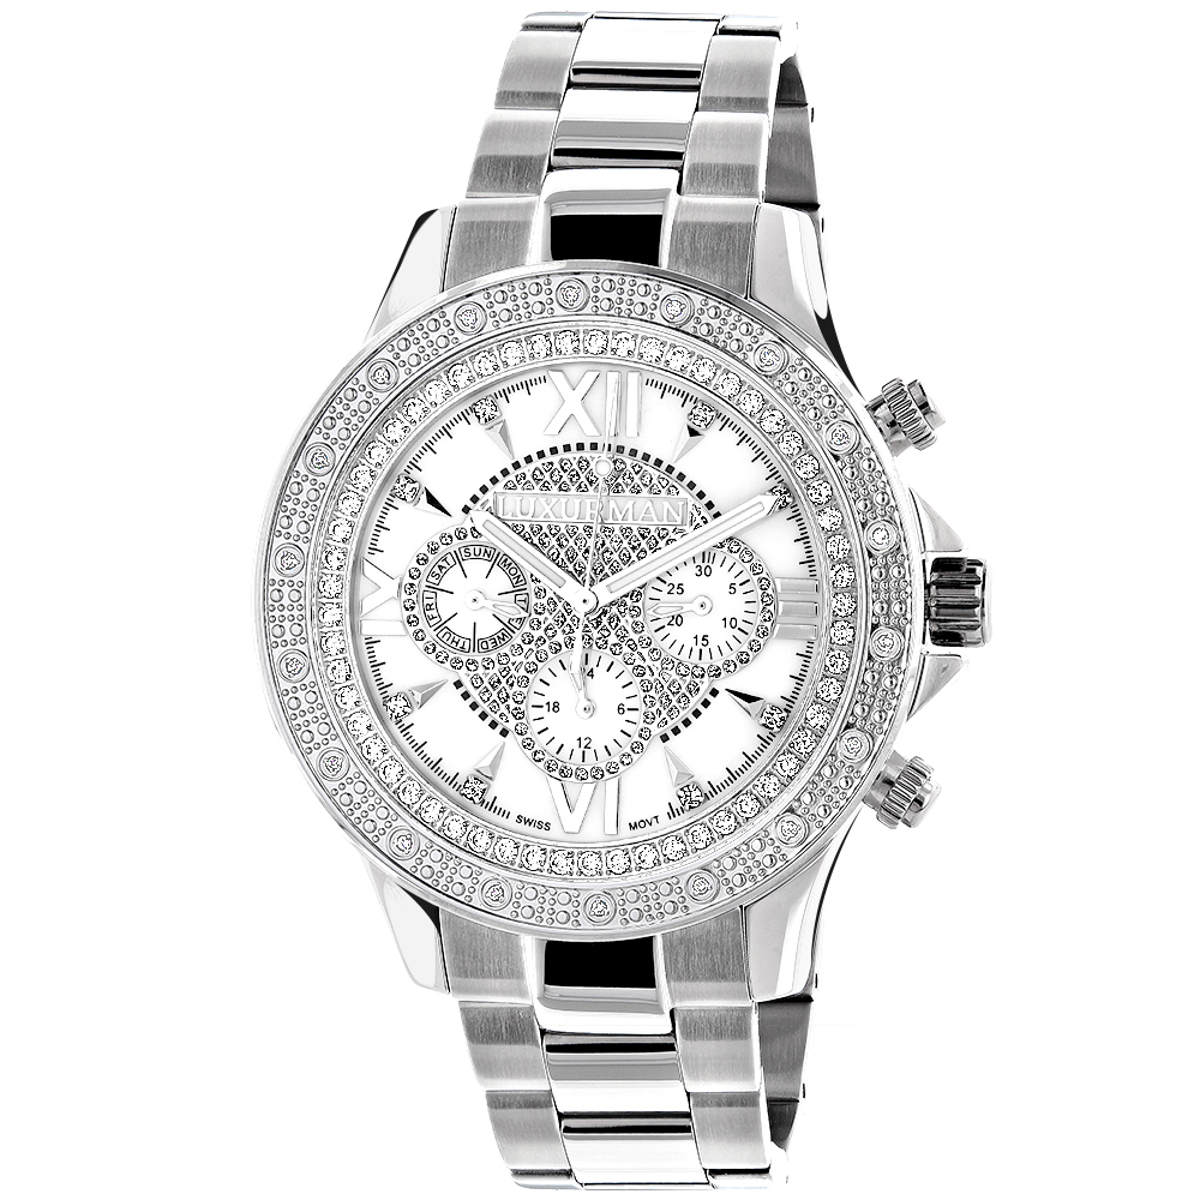 Luxurman Watches: Mens Diamond Watch 0.2ct White MOP